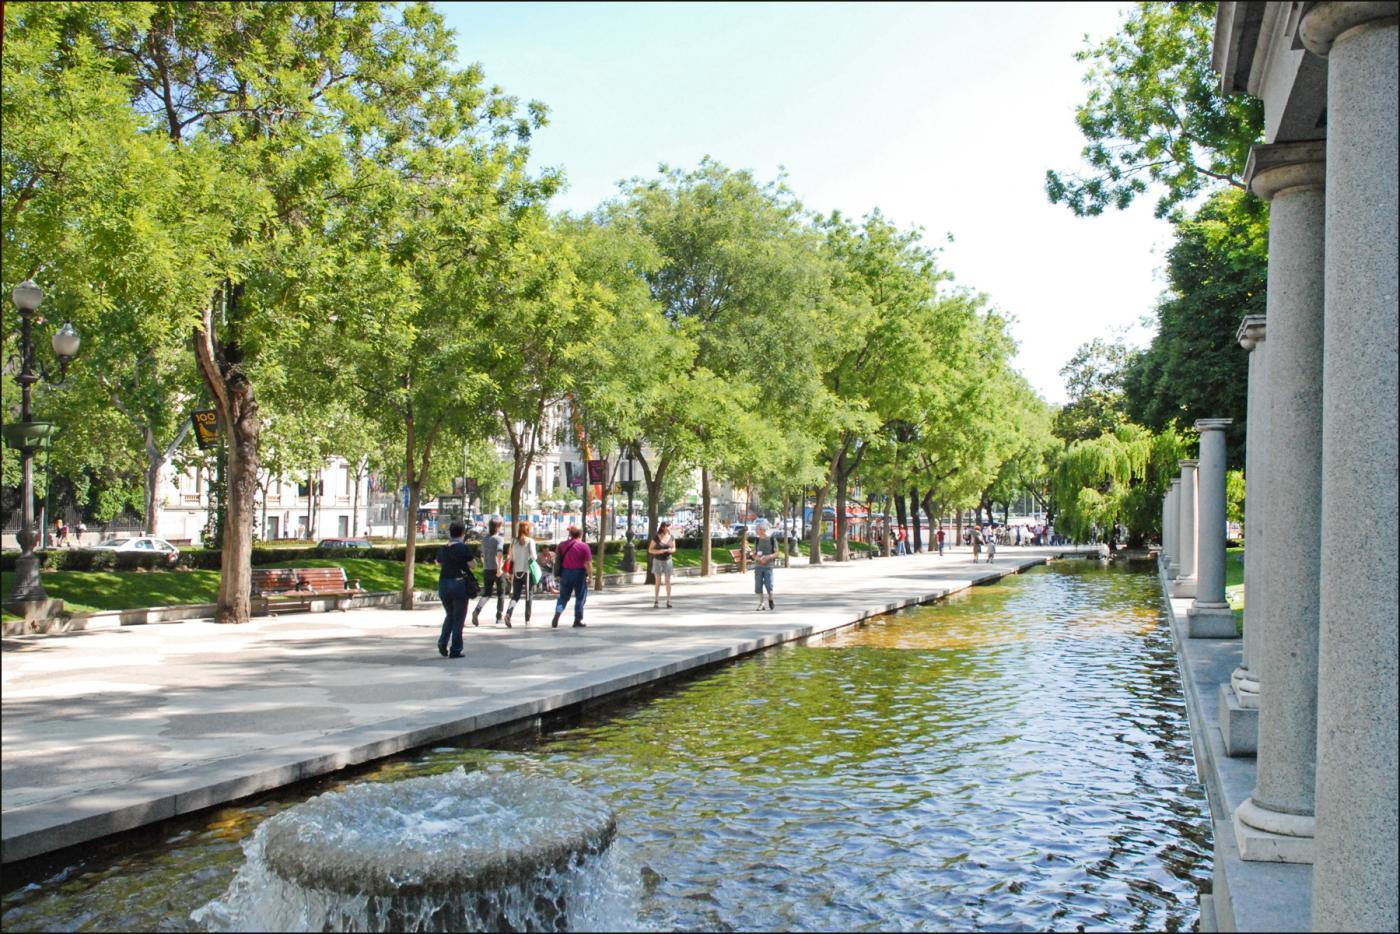 Paseo_de_Recoletos_(Madrid)_(4691303651).jpg